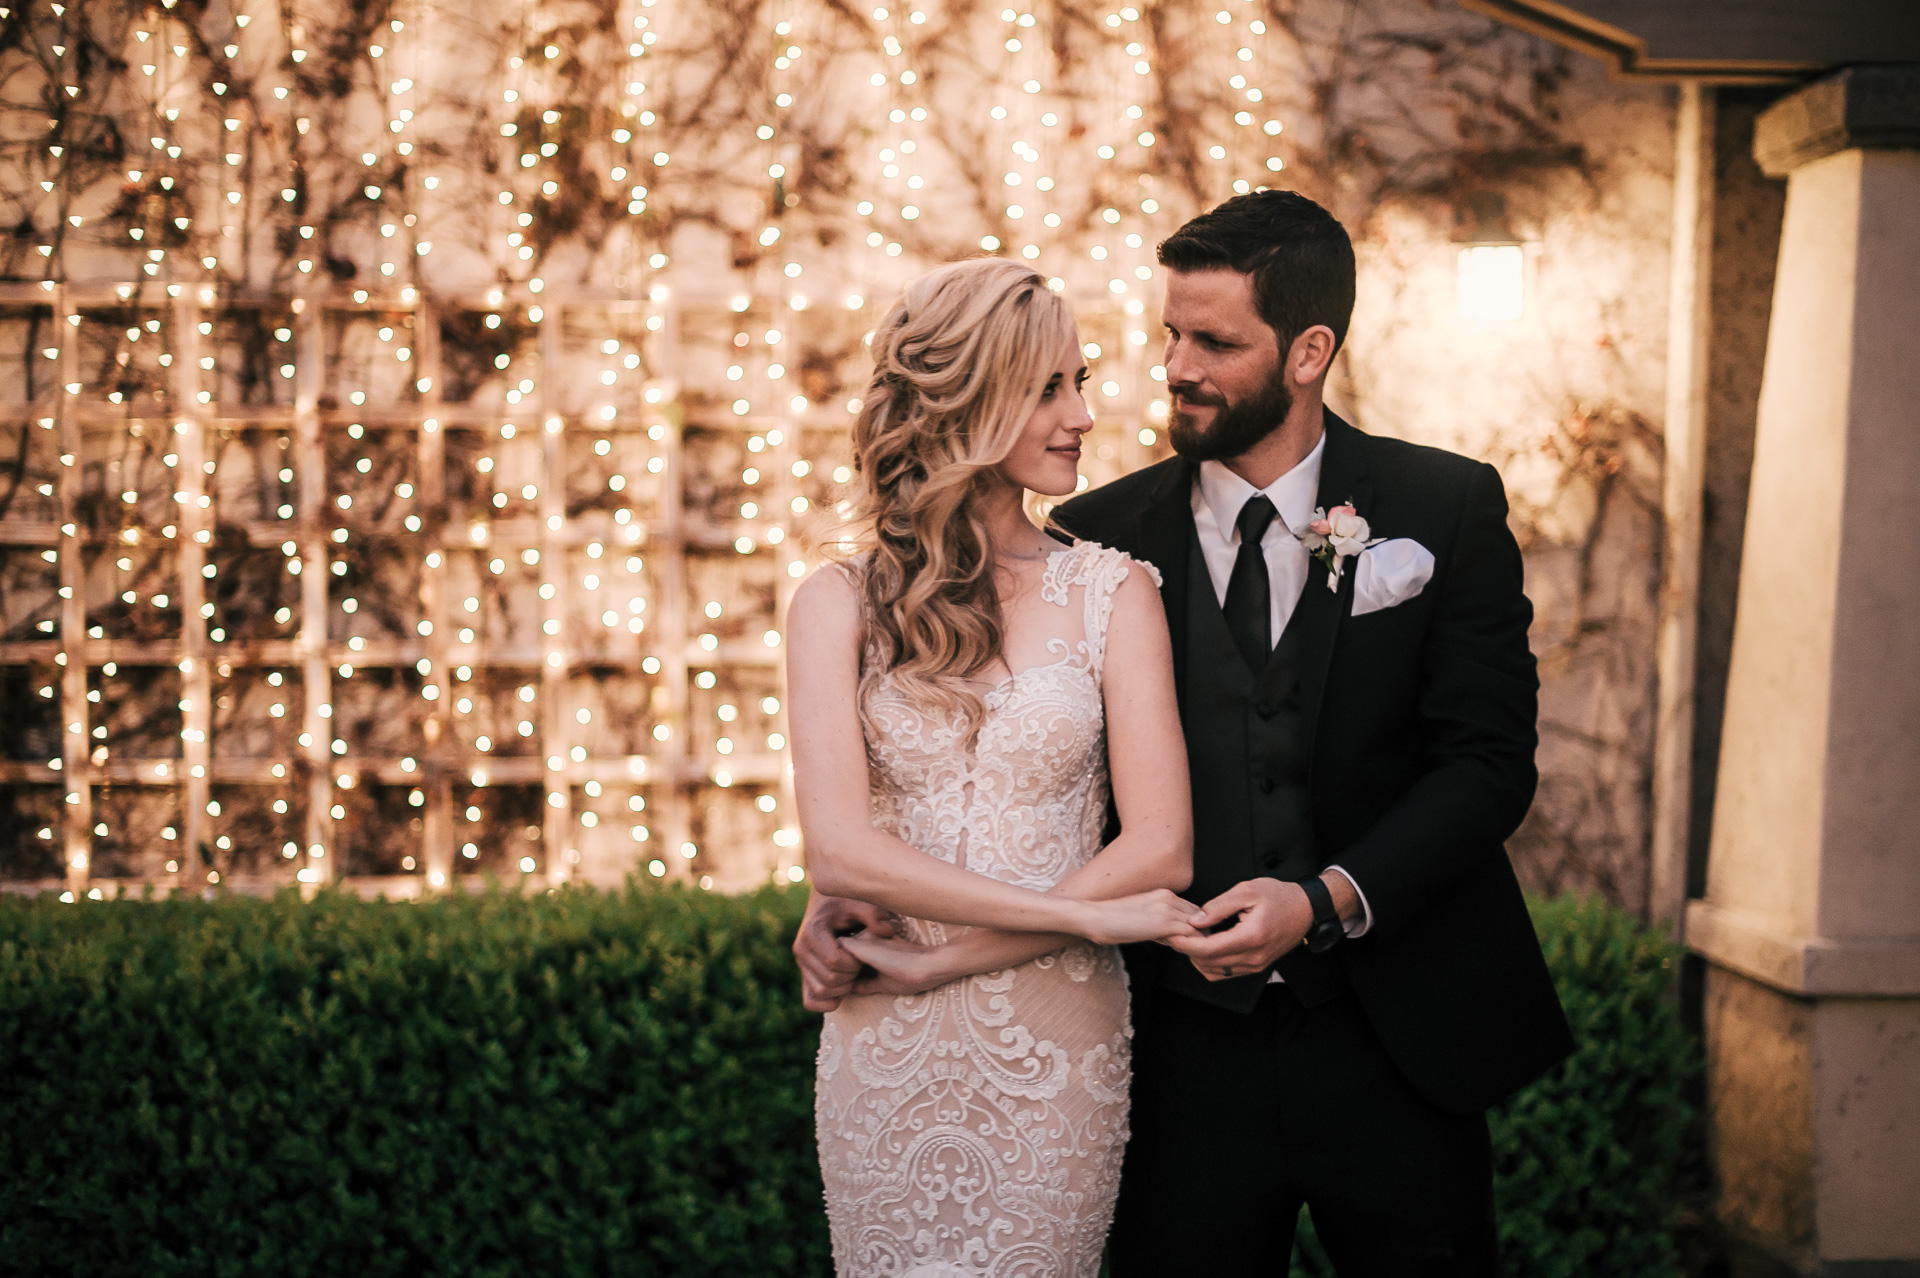 san marcos wedding photographer at the Twin Oaks Golf Course in San Marcos, San Diegos premier wedding venue